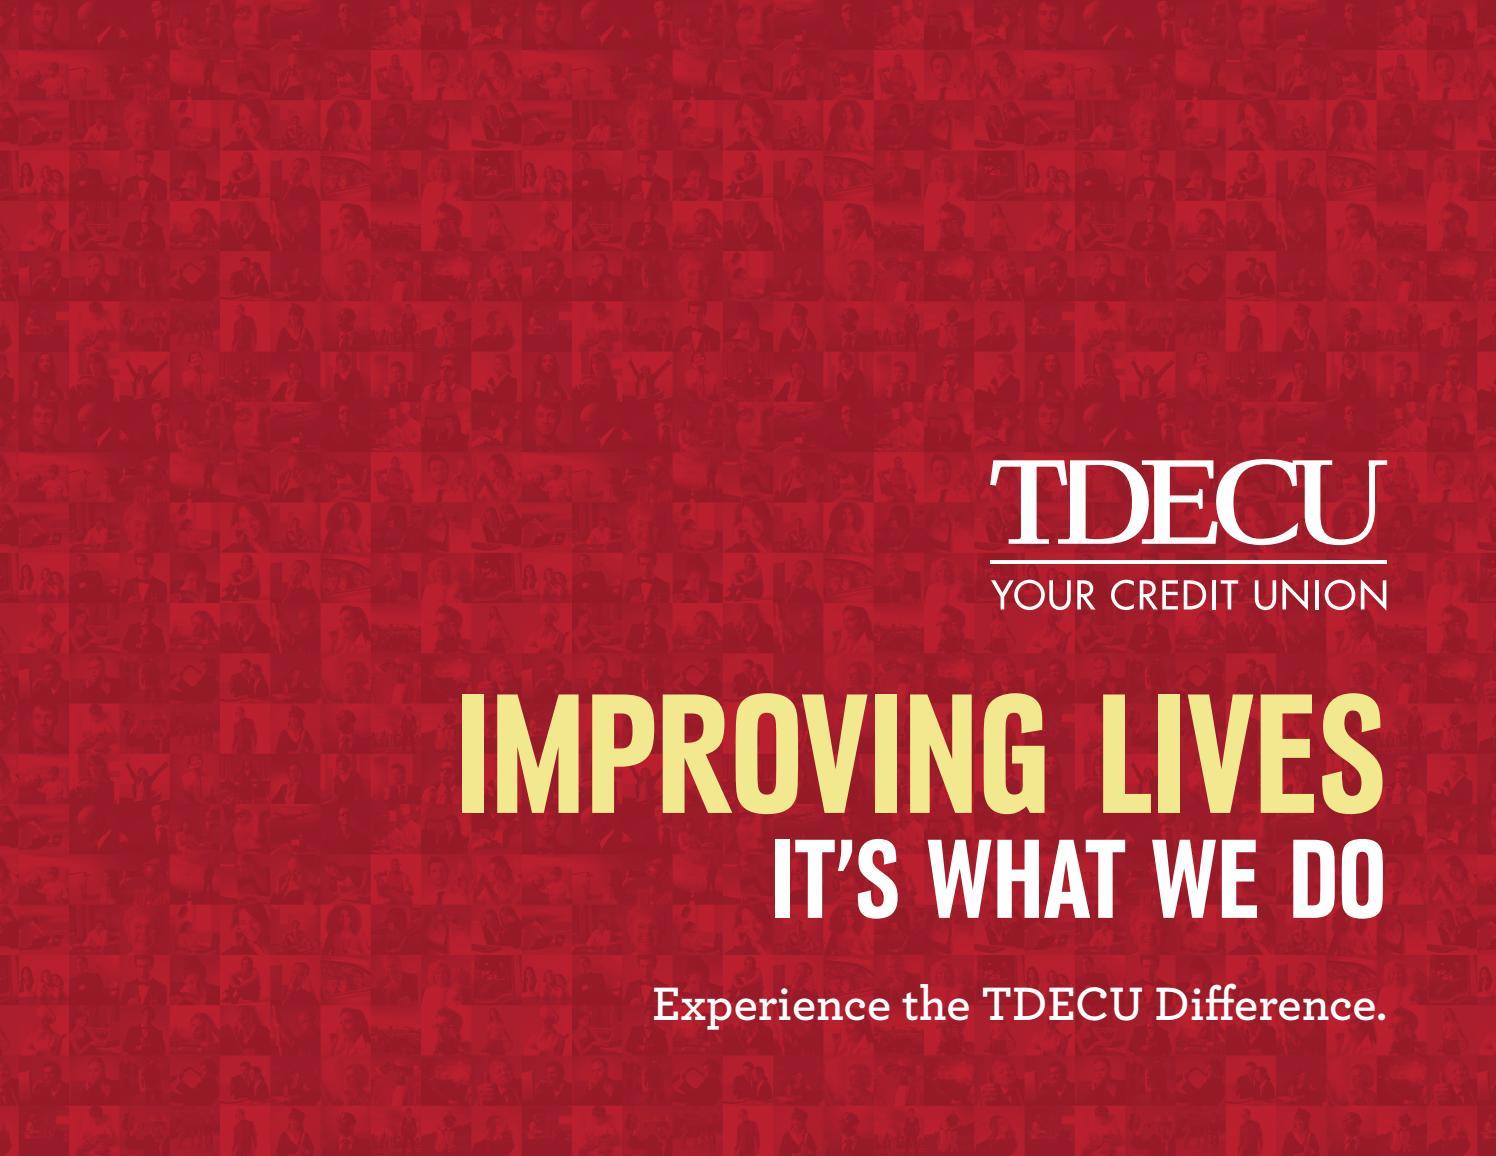 tdecu multi lines of business by tdecumarketing